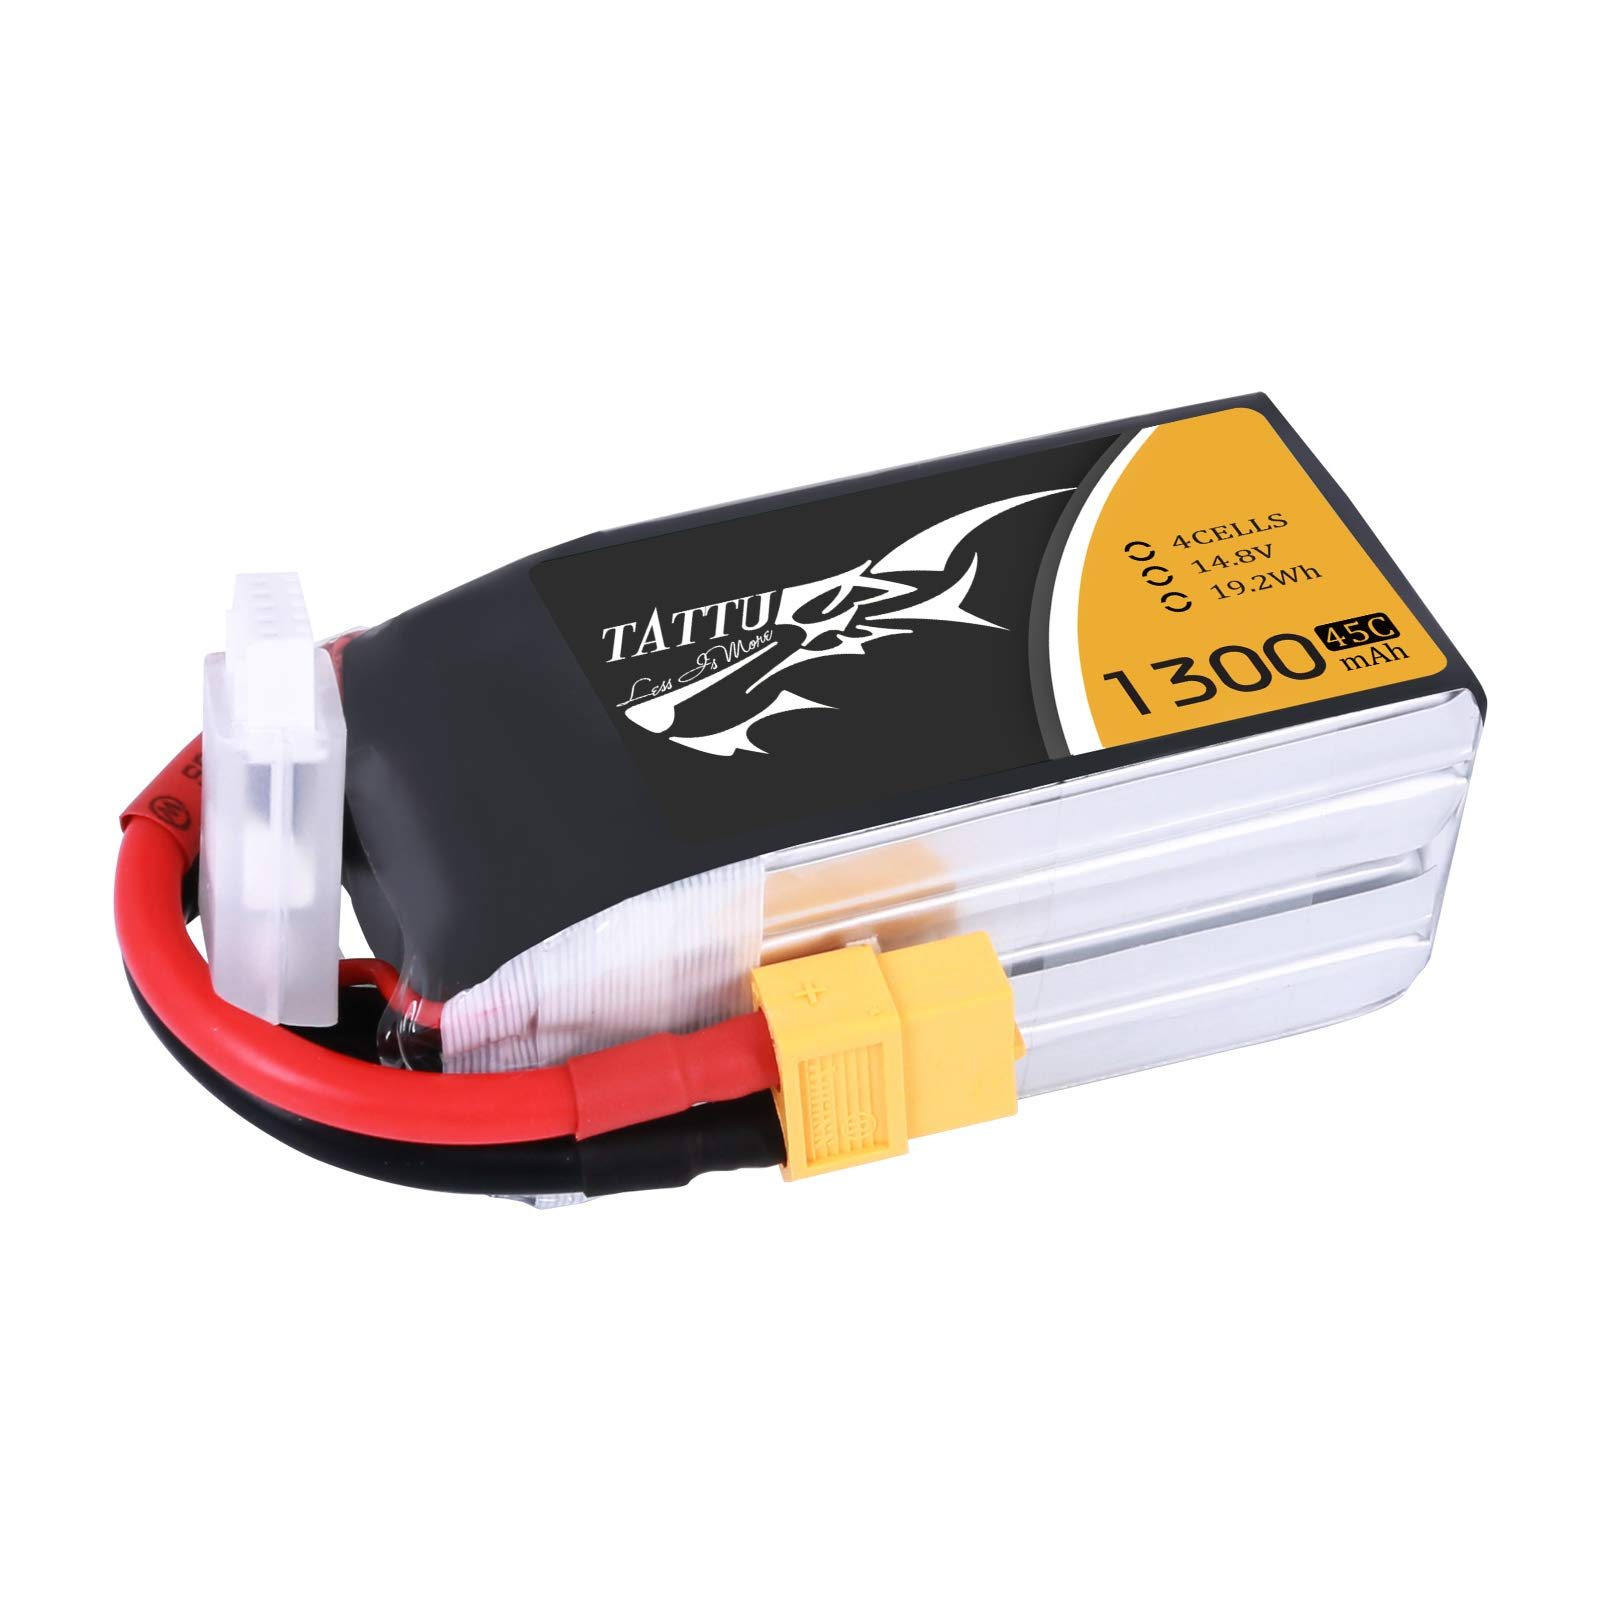 Tattu 14.8V 1300mAh LiPo Battery Pack 45C 4S with XT60 Plug for Nemesis 240 Mini Tweaker 180 Micro Quad LRC Freestyle V1 MXP180 Danaus Vortex FLIP 250S Mini FLIP RC Heli Airplane Drone FPV Quadcopter